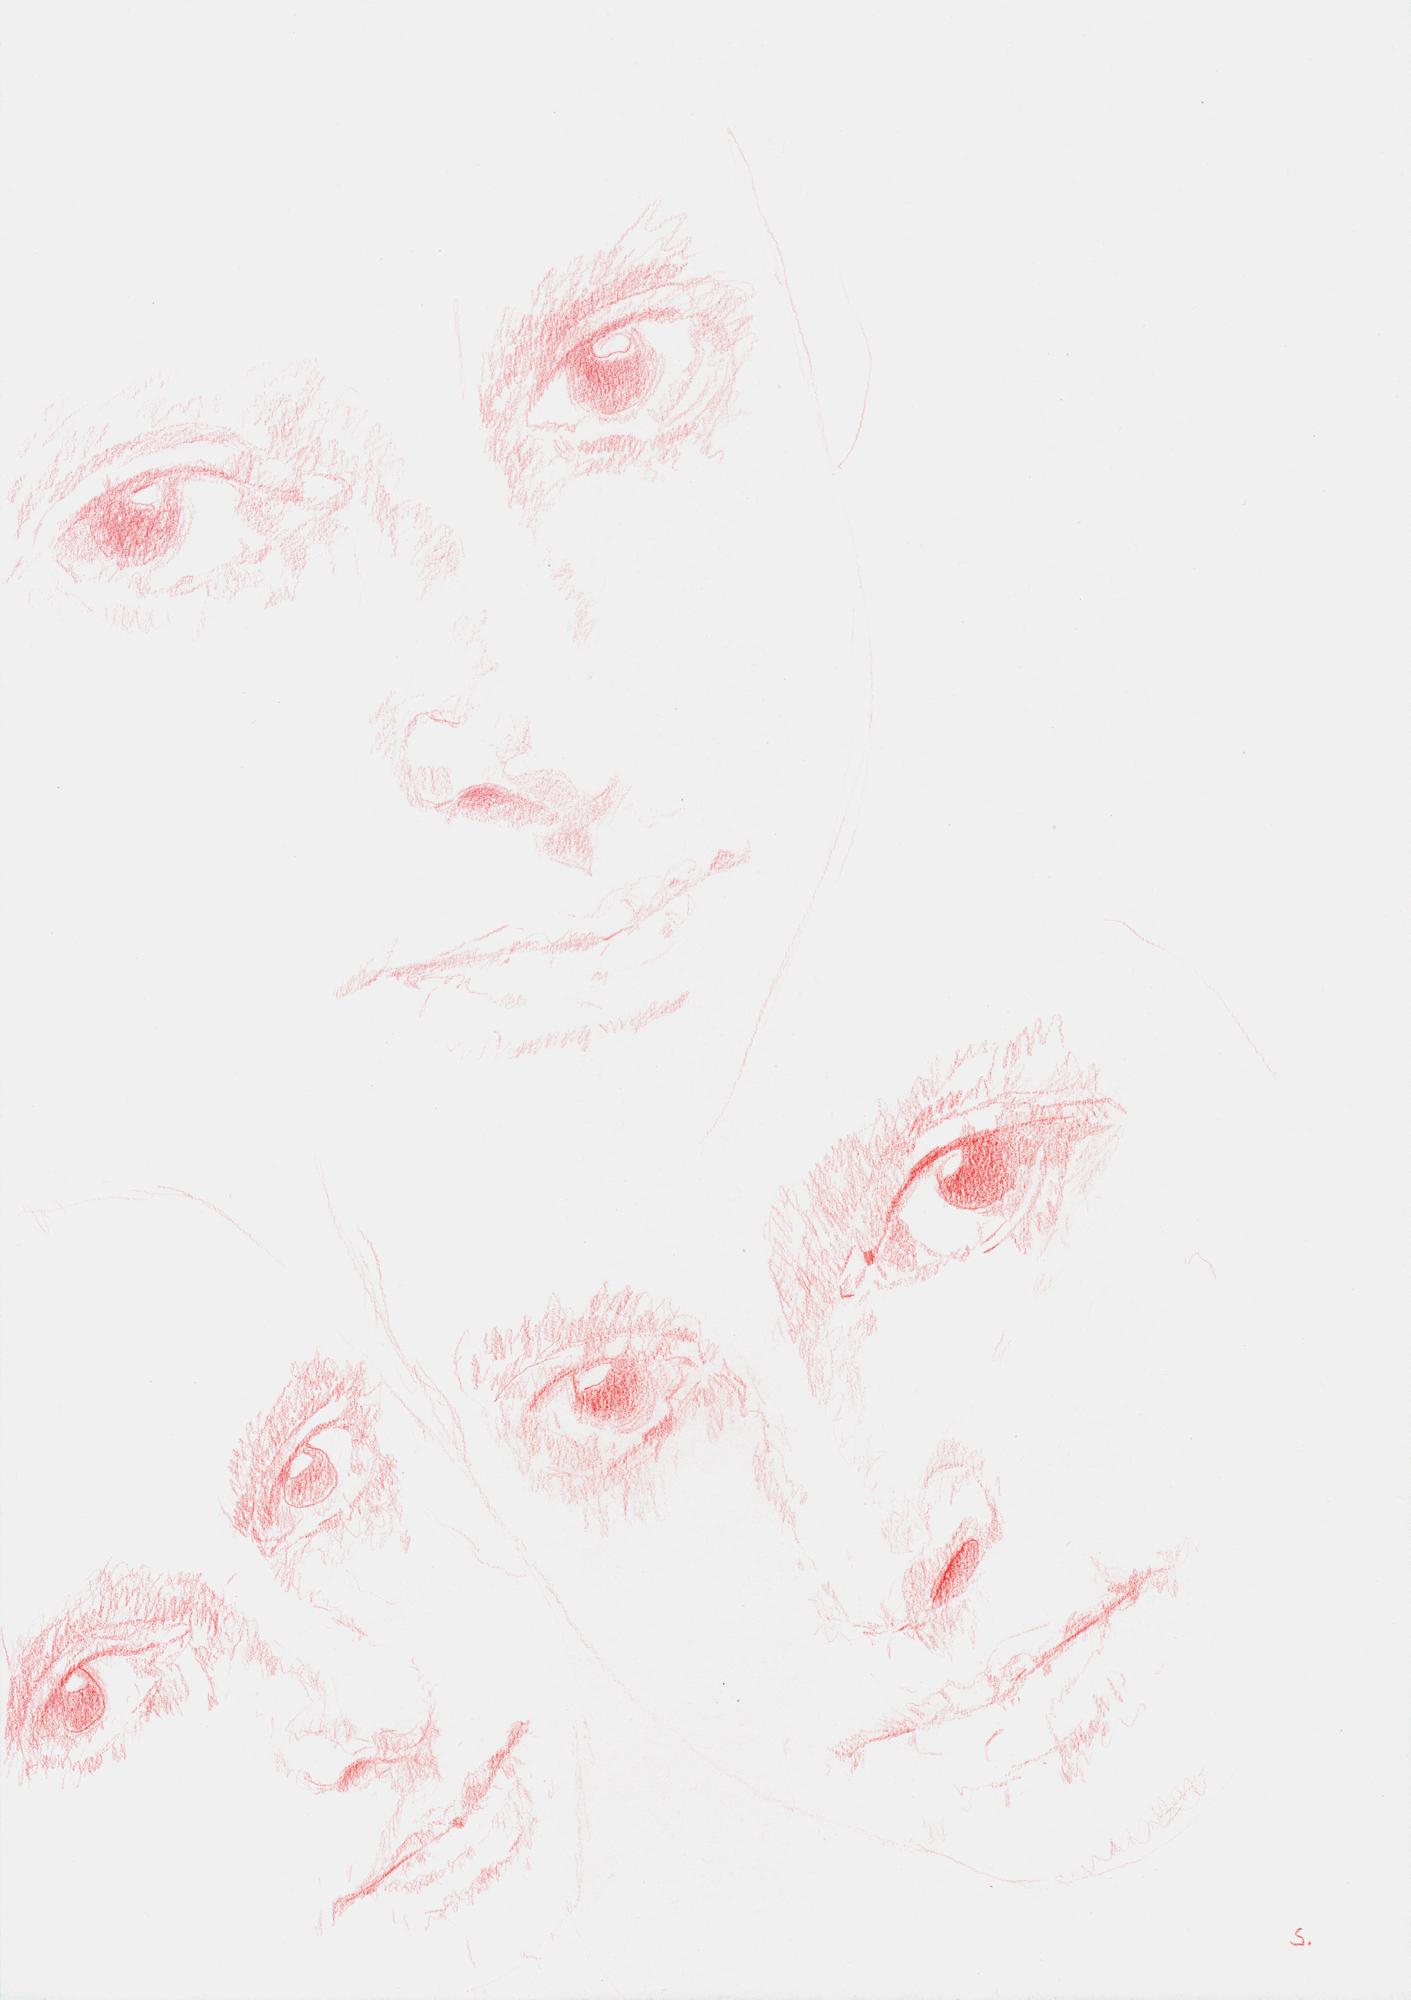 """Maria Luiko, Memorial 01"", 2017, Zeichnung auf Büttenpapier, 42 x 29,5cm, Roter Farbstift; ©: Konstanze Sailer"